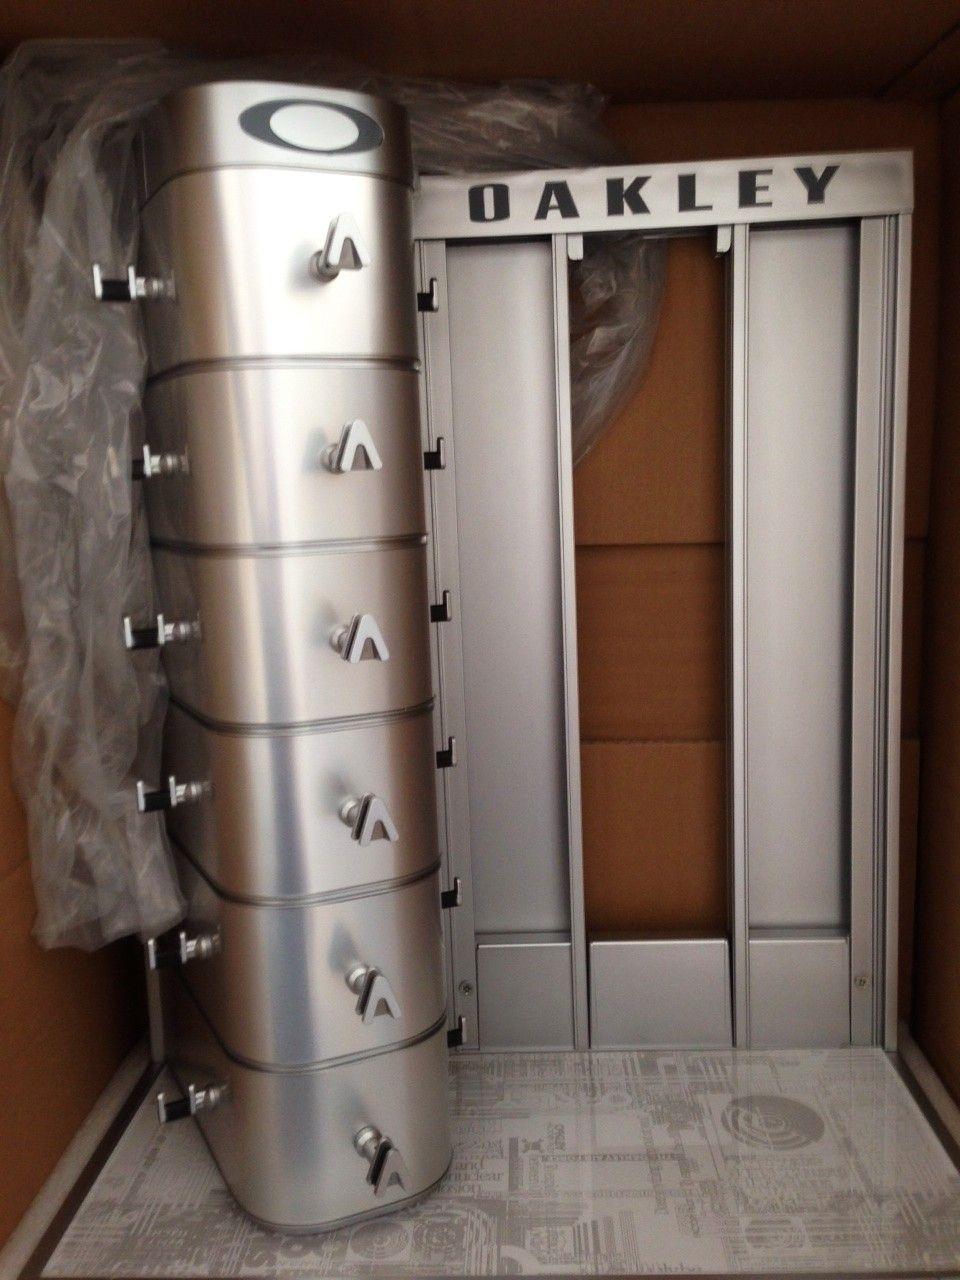 New in Box Oakley Counter Display - IMG_7813.JPG